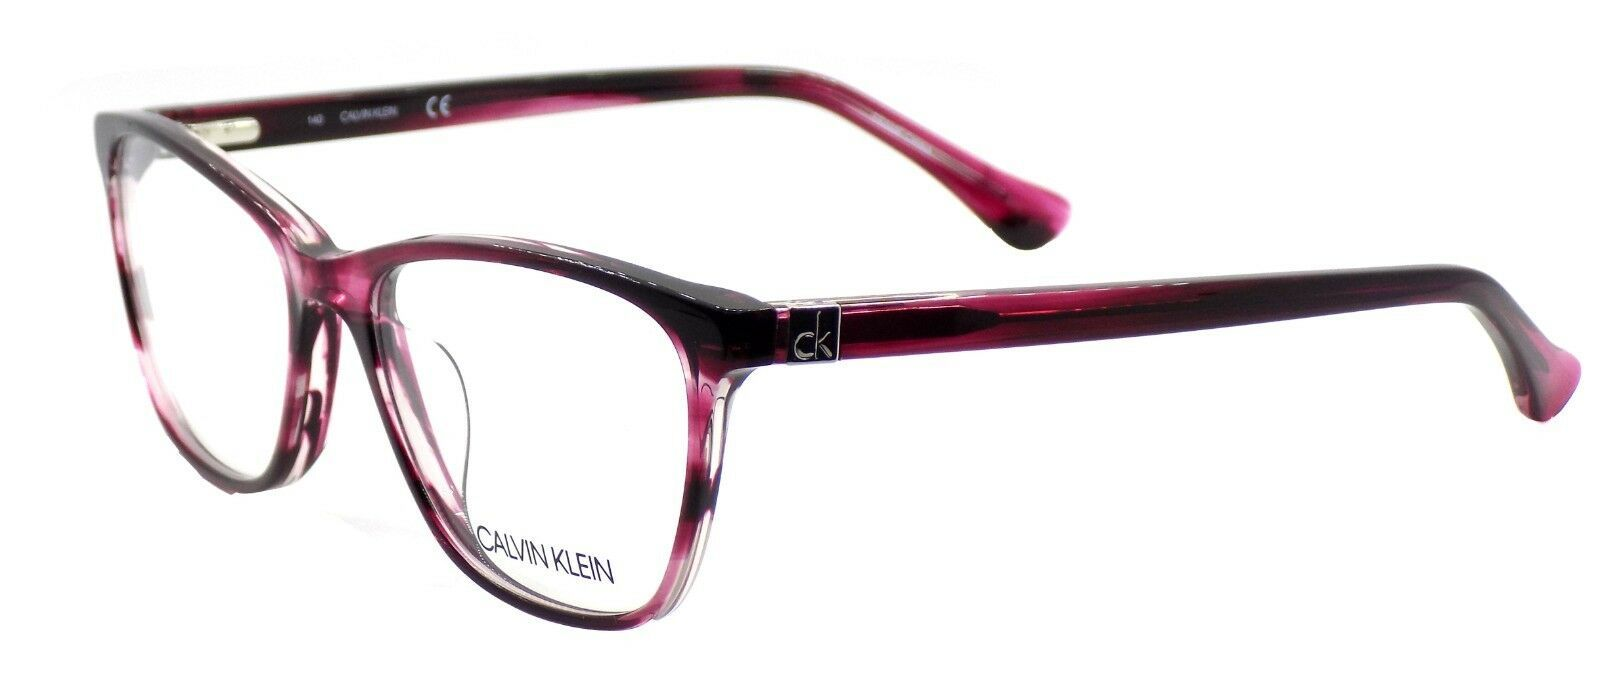 Calvin Klein CK5883 609 Women's Eyeglasses Frames Striped Wine 52-18-140 + CASE